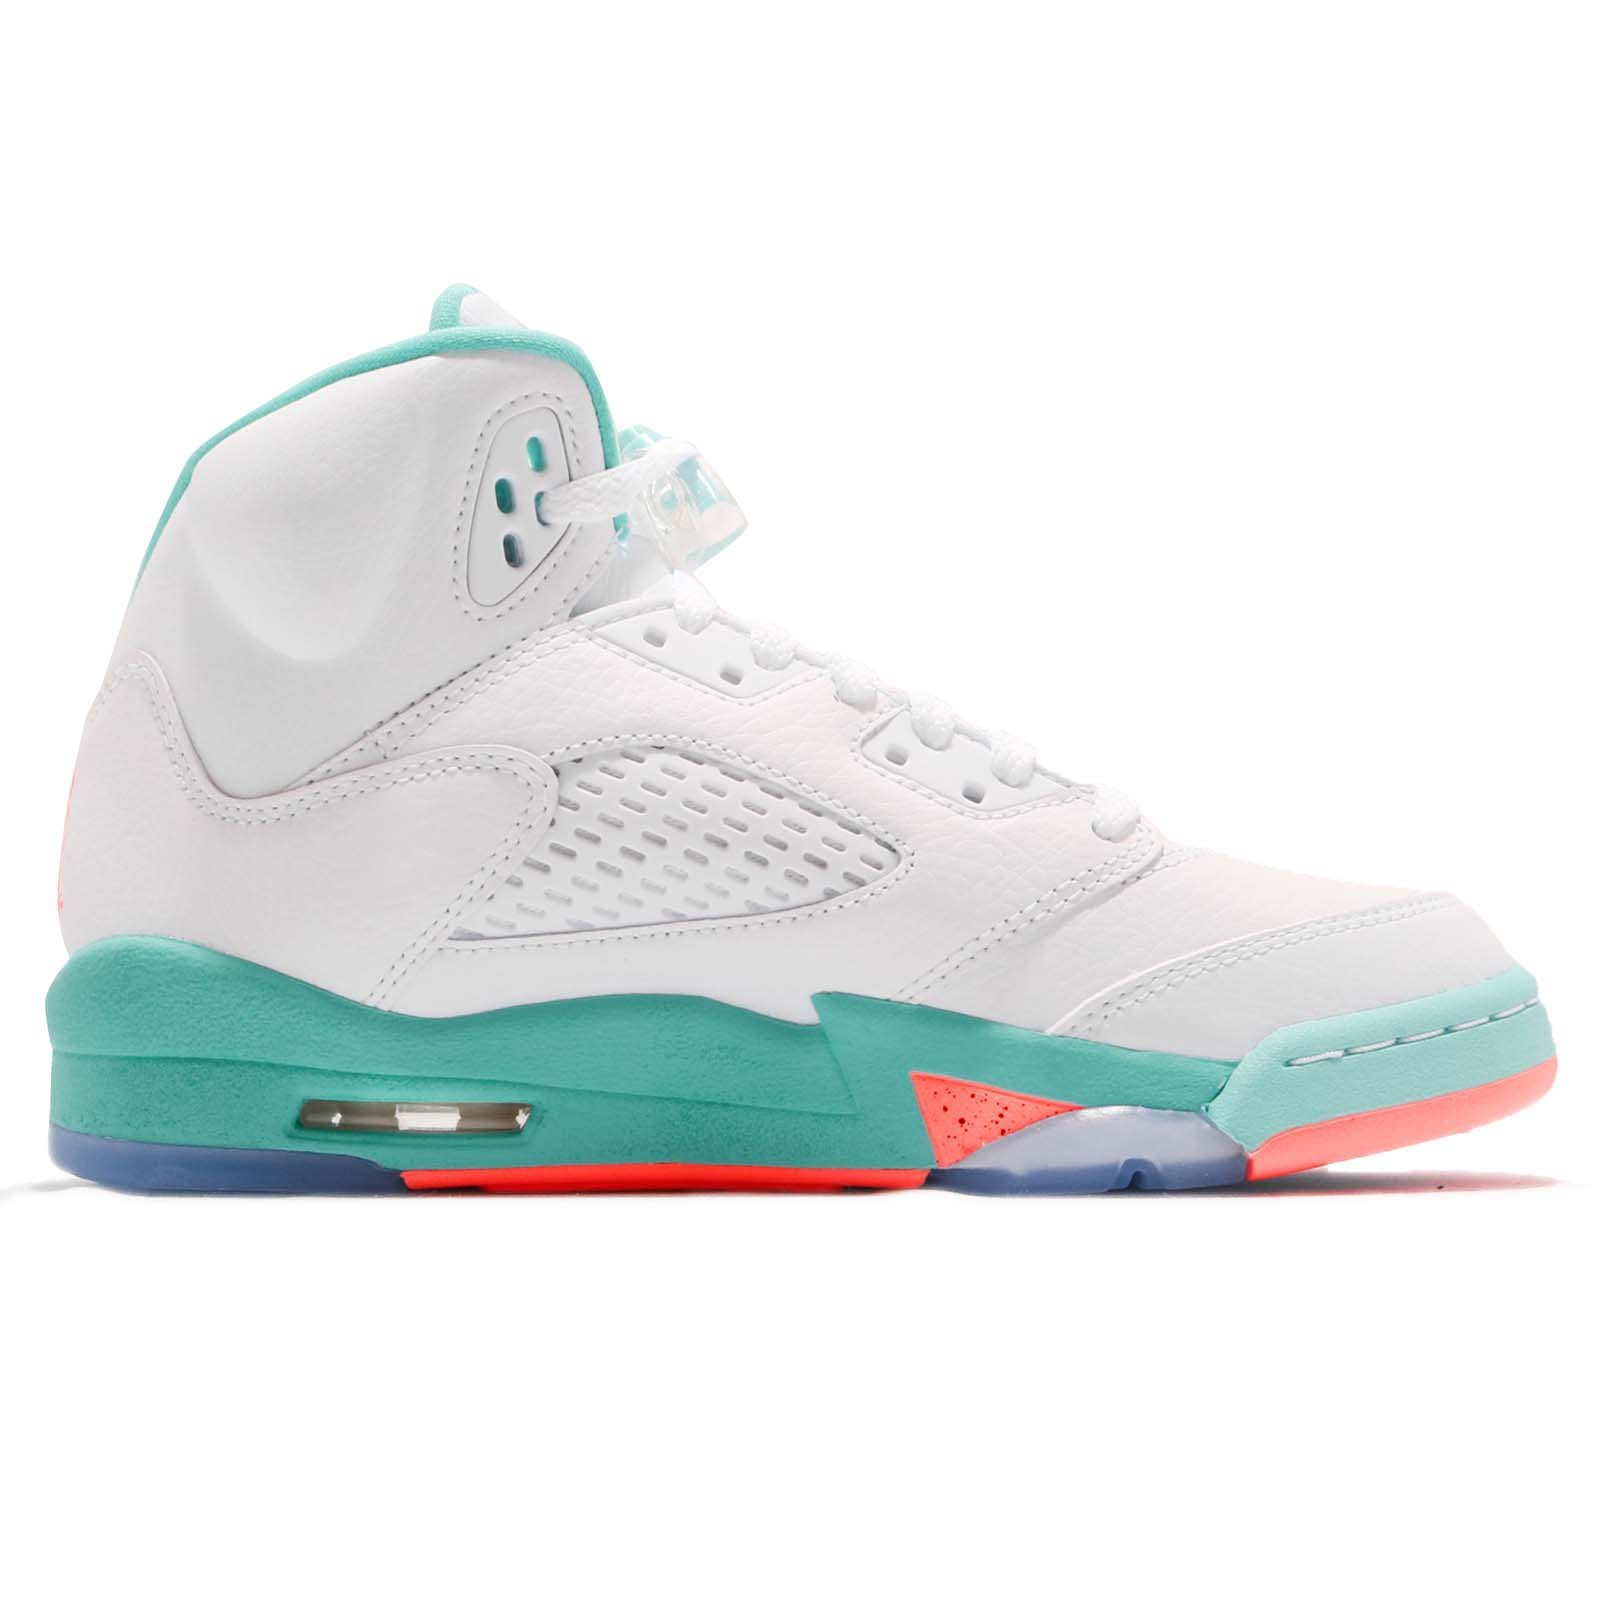 b004924ea5d Nike Air Jordan 5 Retro Kids GS White/Crimson Pulse-Light Aqua 440892-100  (Size: 4Y)